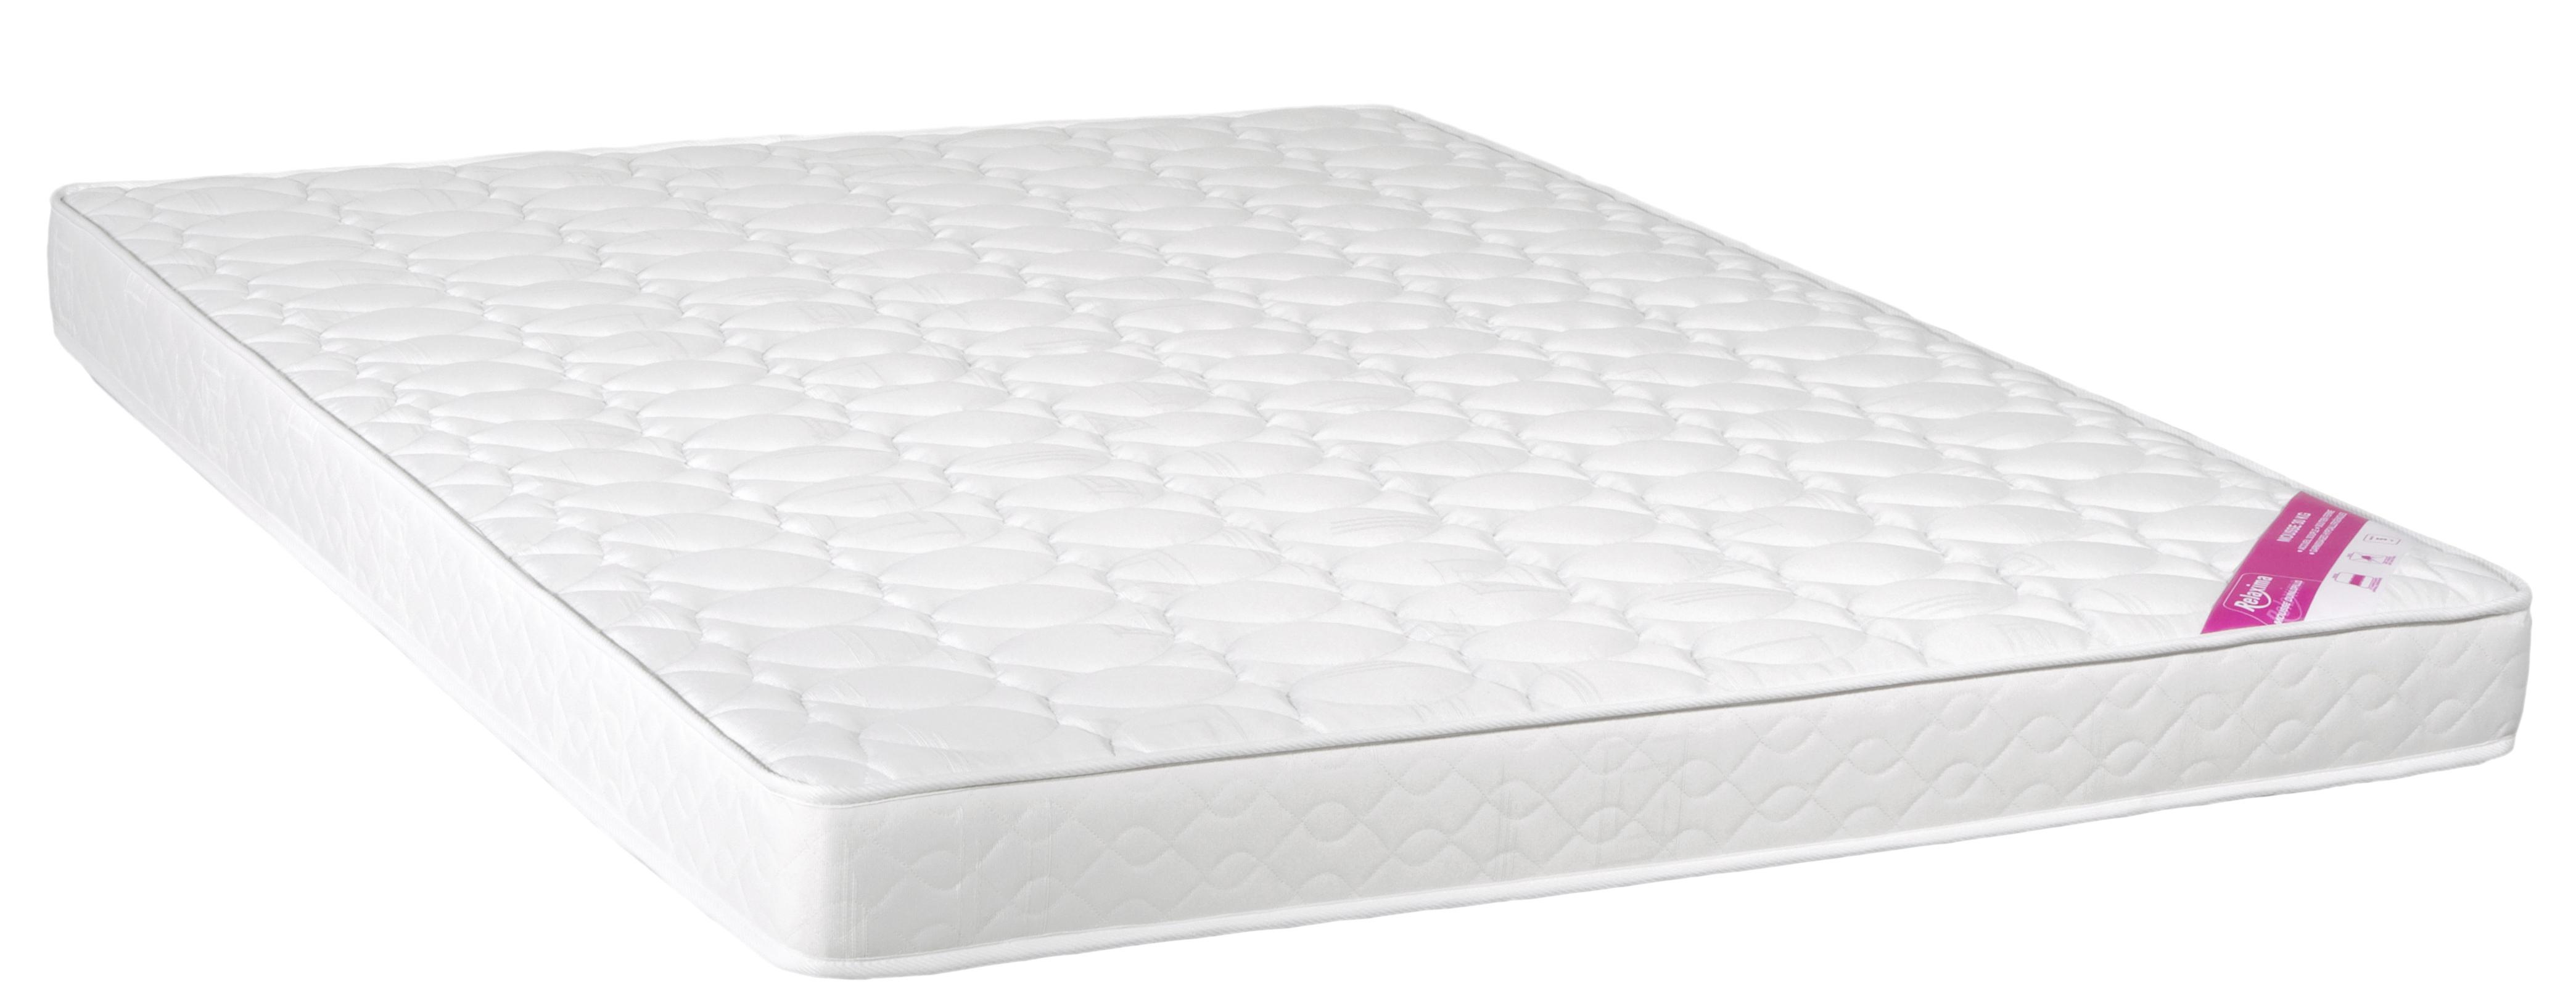 matelas mousse 160 x 200 cm dunlopillo hr 30 kg relaxima. Black Bedroom Furniture Sets. Home Design Ideas